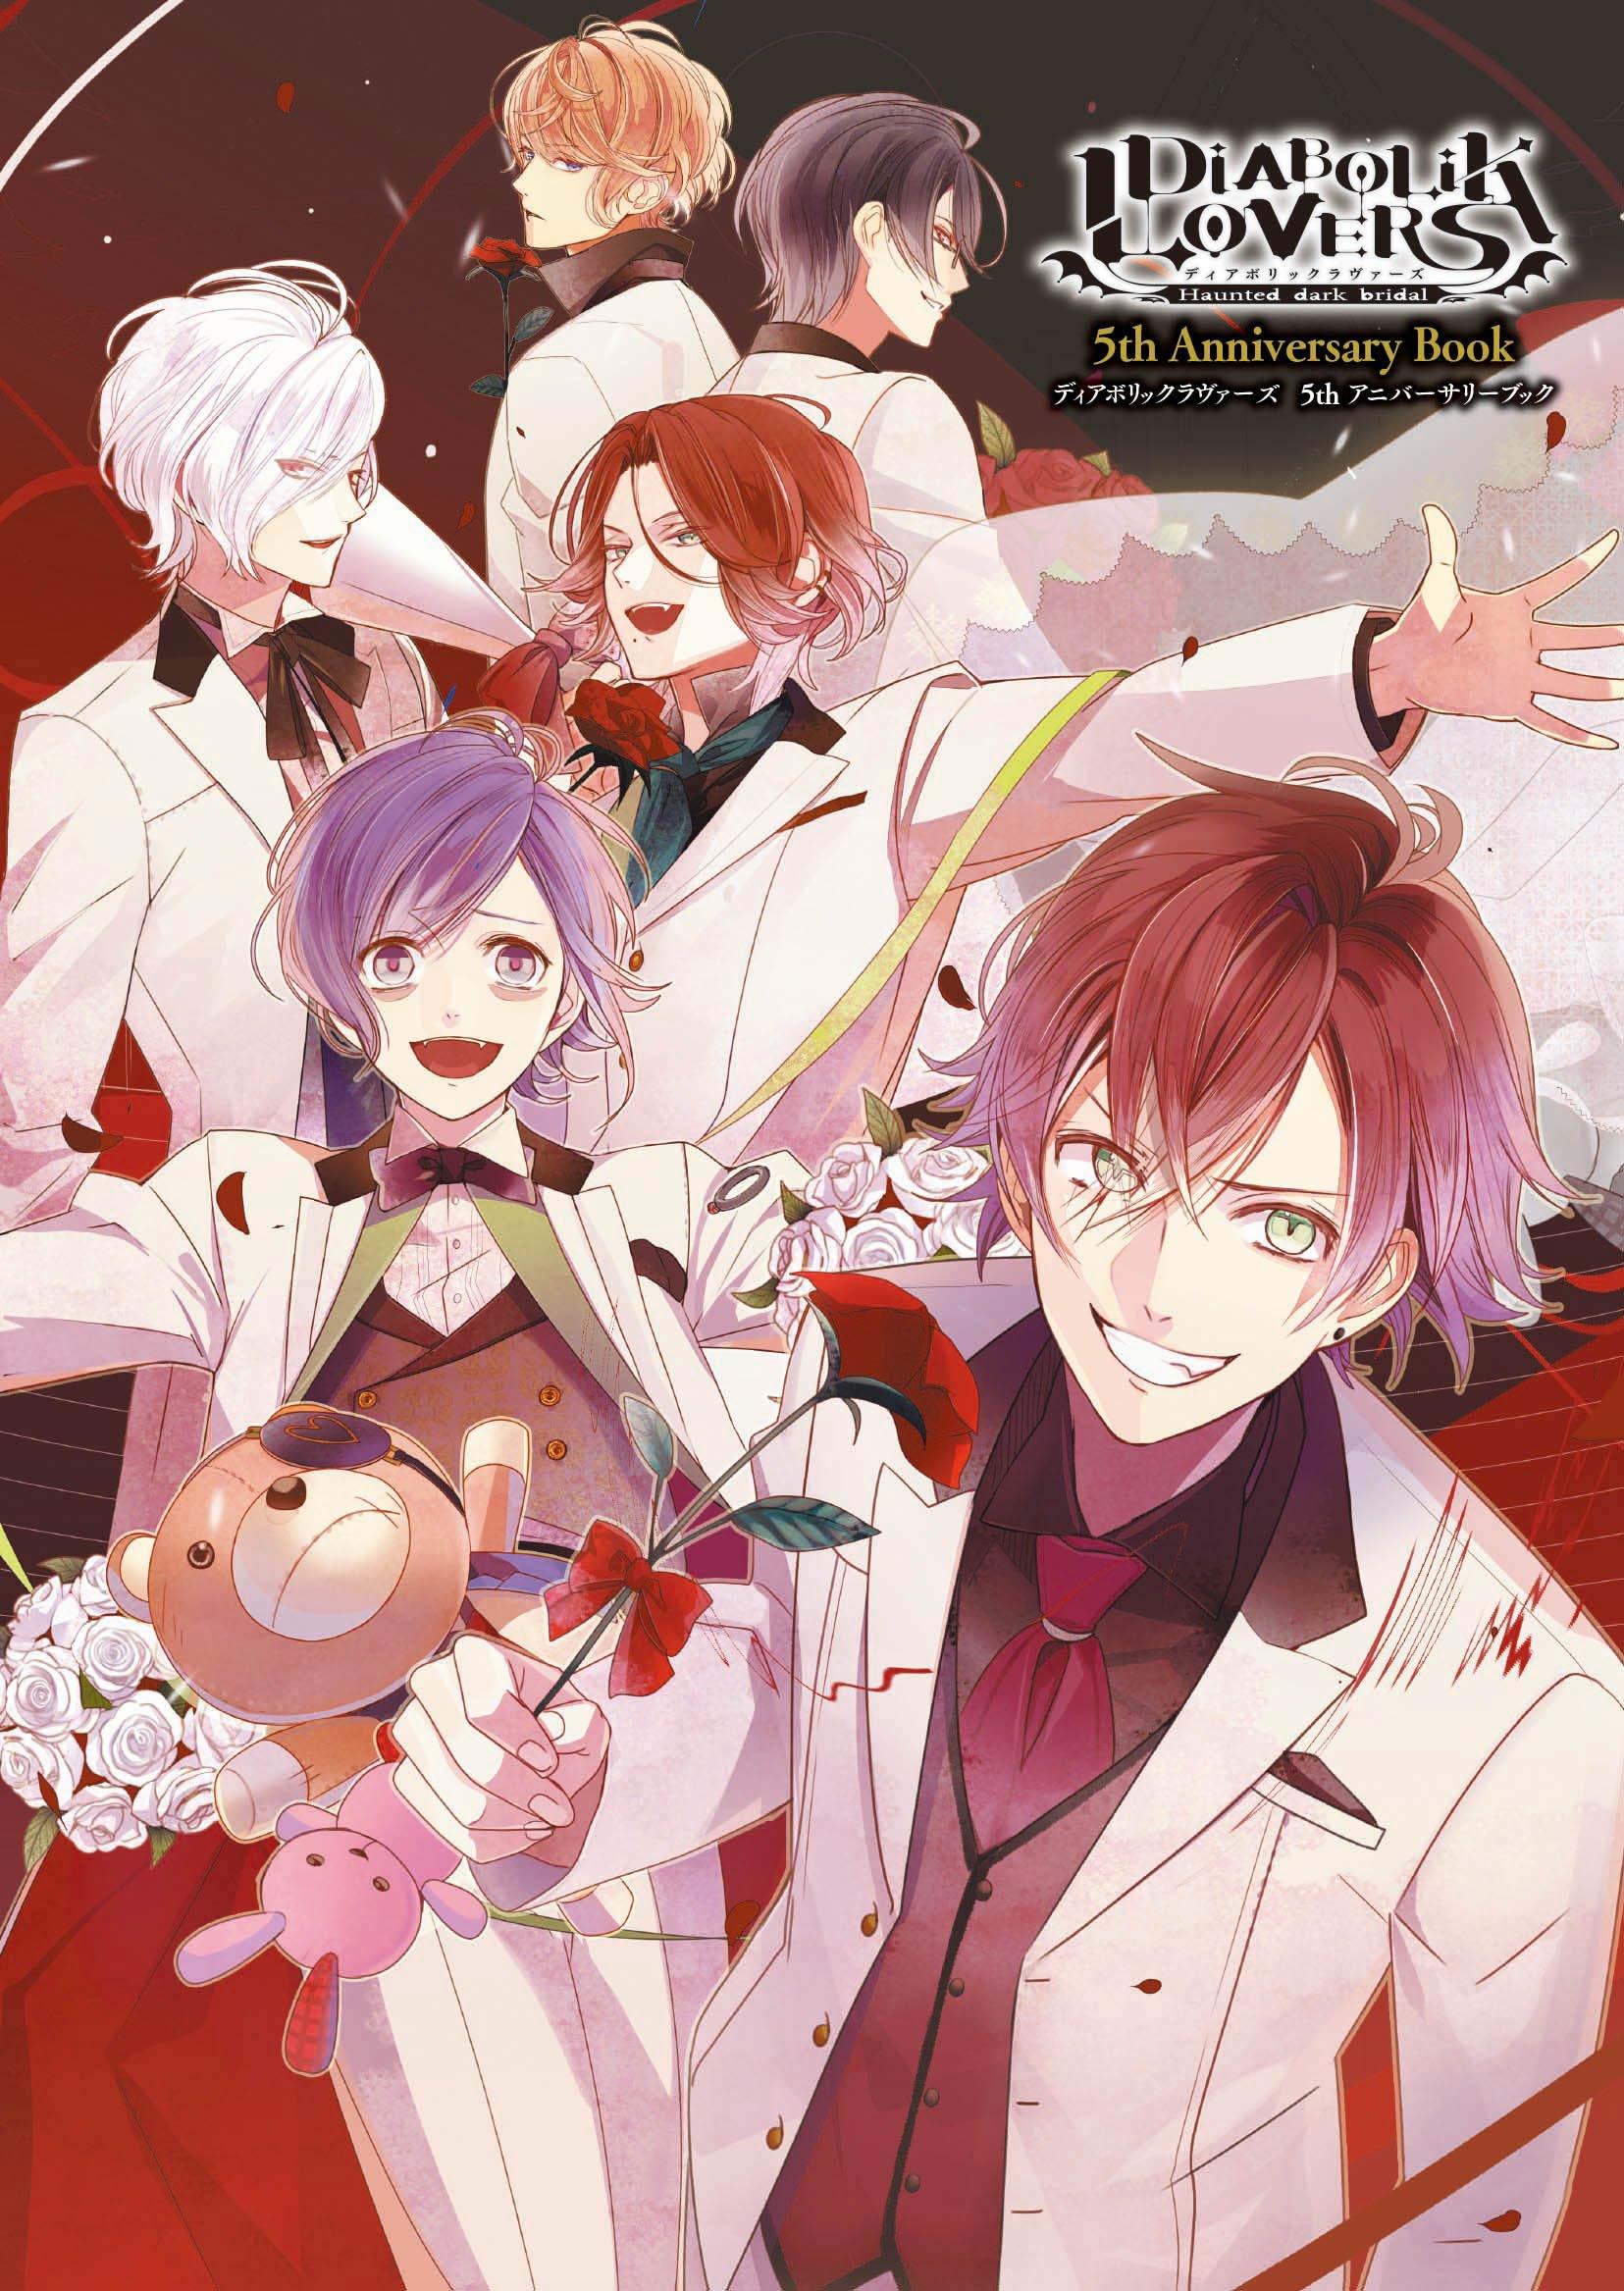 Diabolik Lovers - 5th Anniversary Book 1